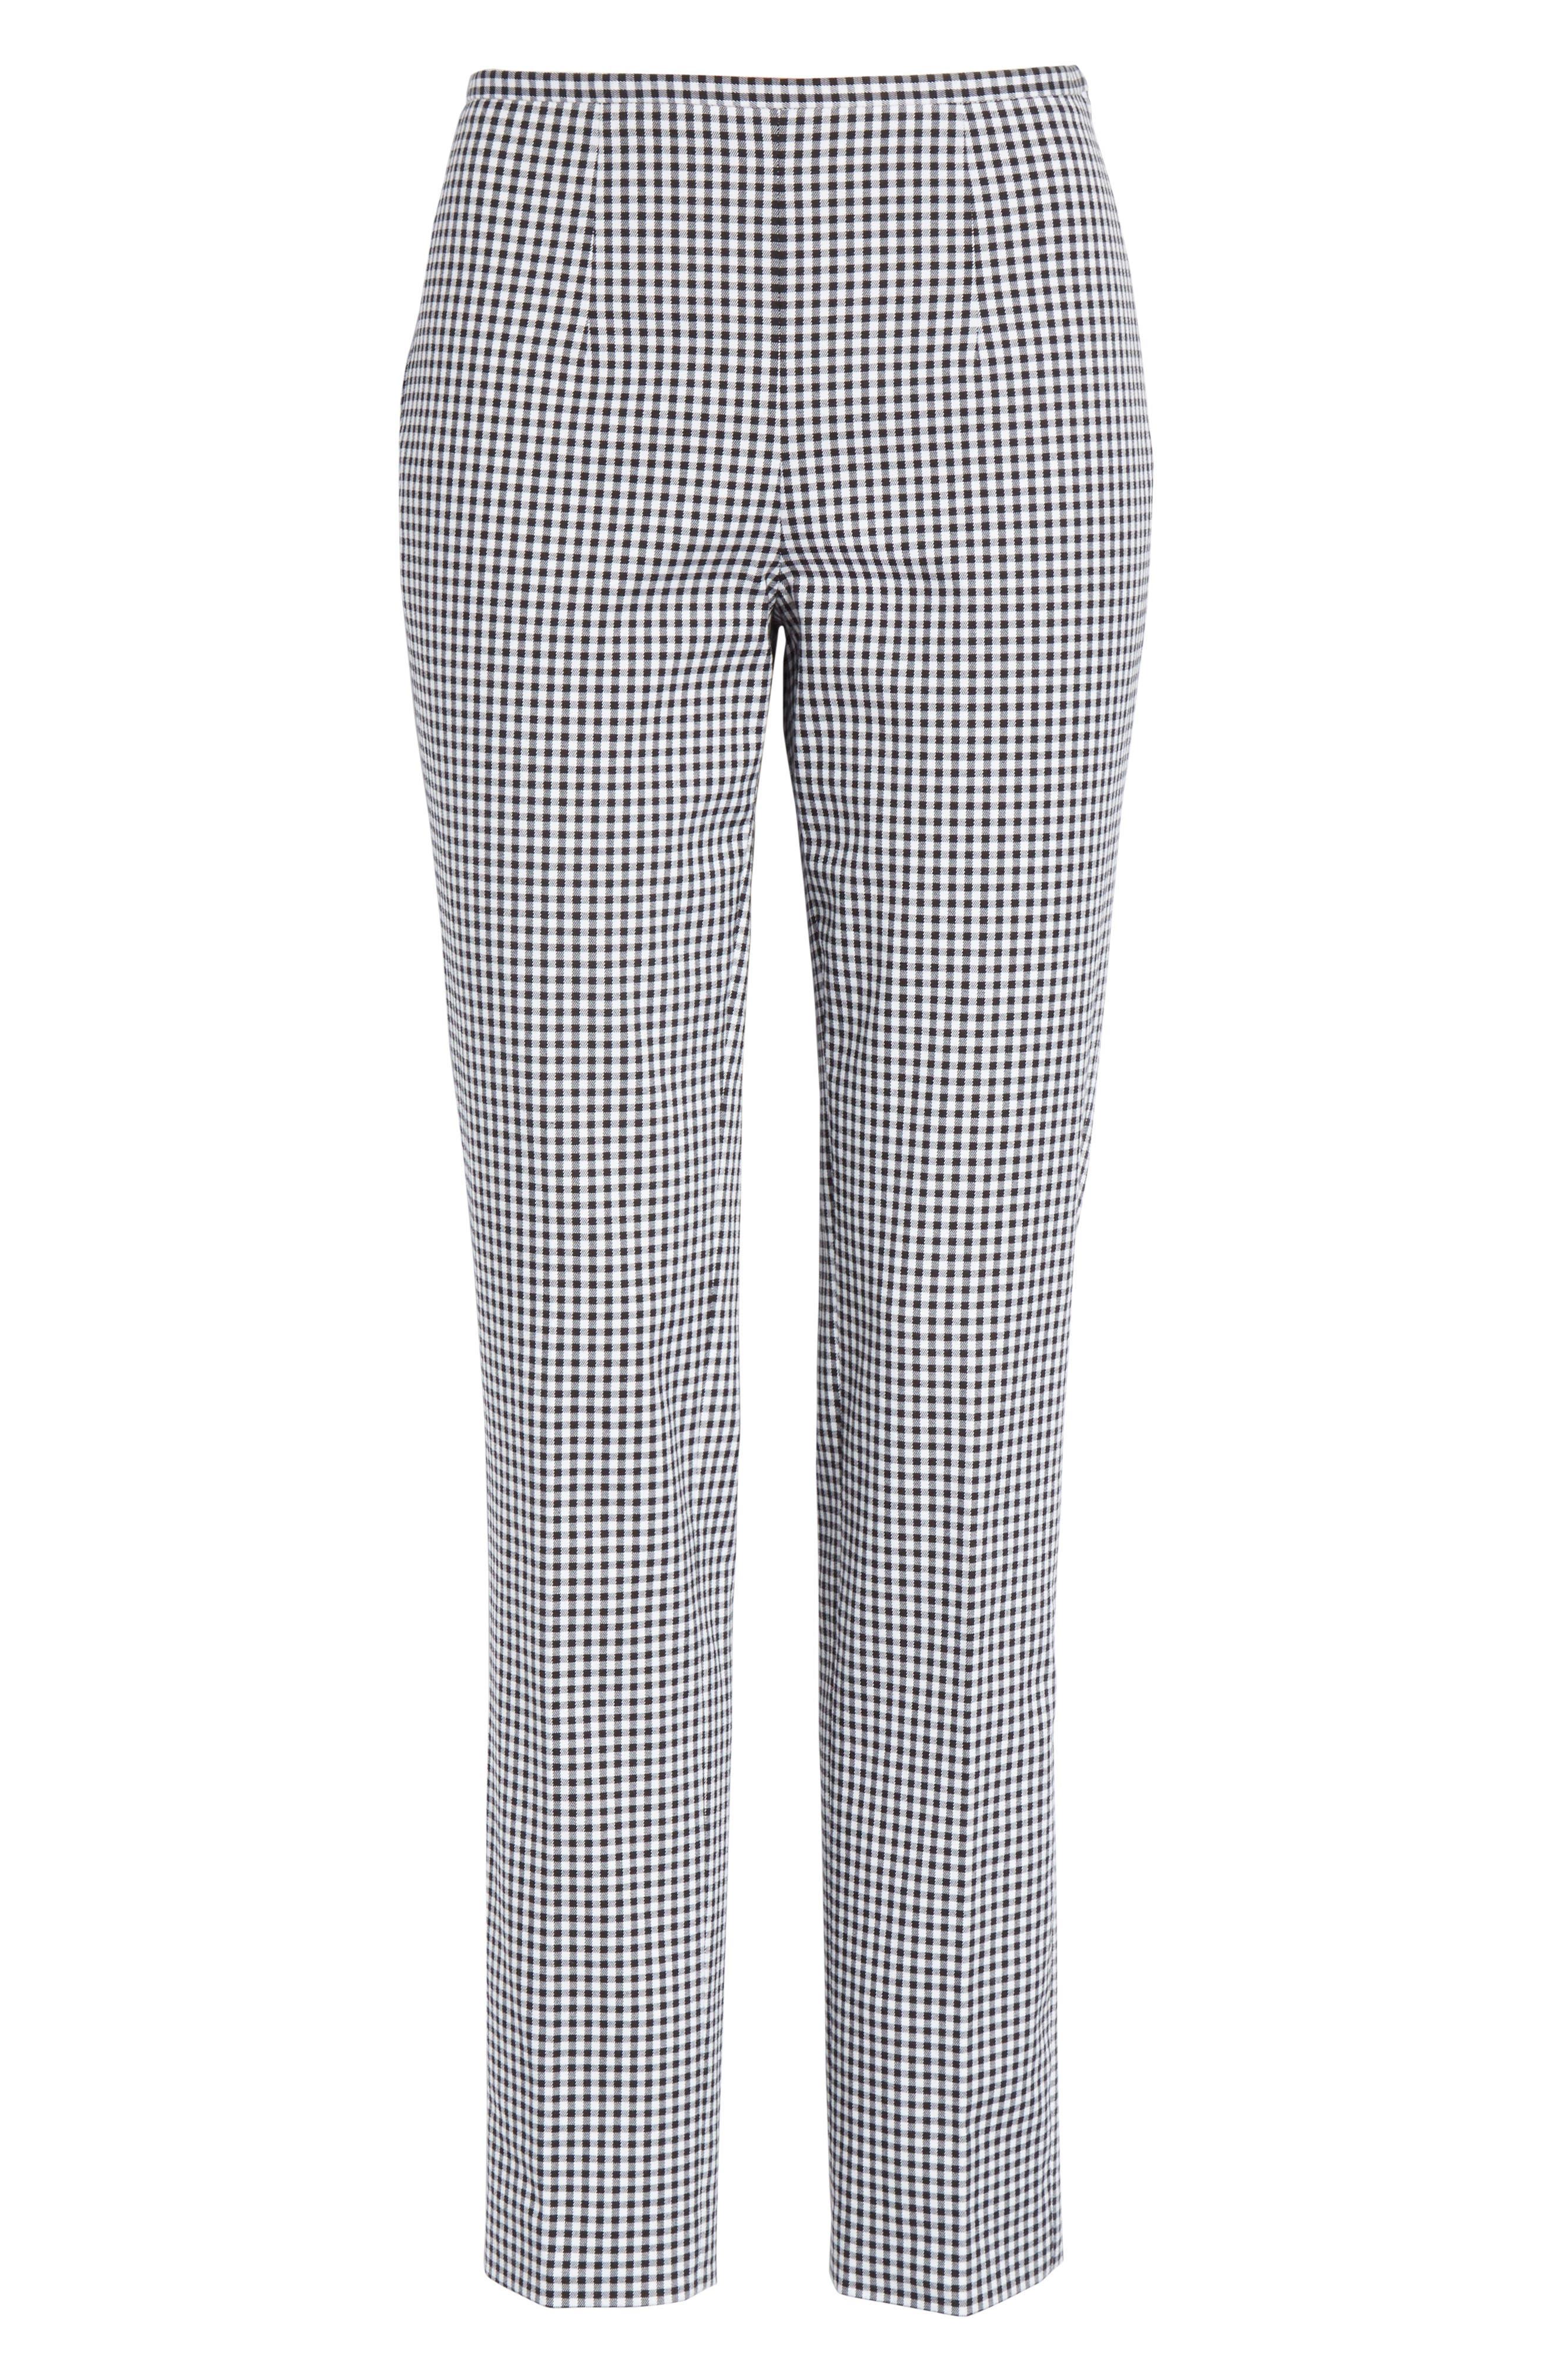 Gingham Stretch Cotton Pants,                             Alternate thumbnail 6, color,                             003